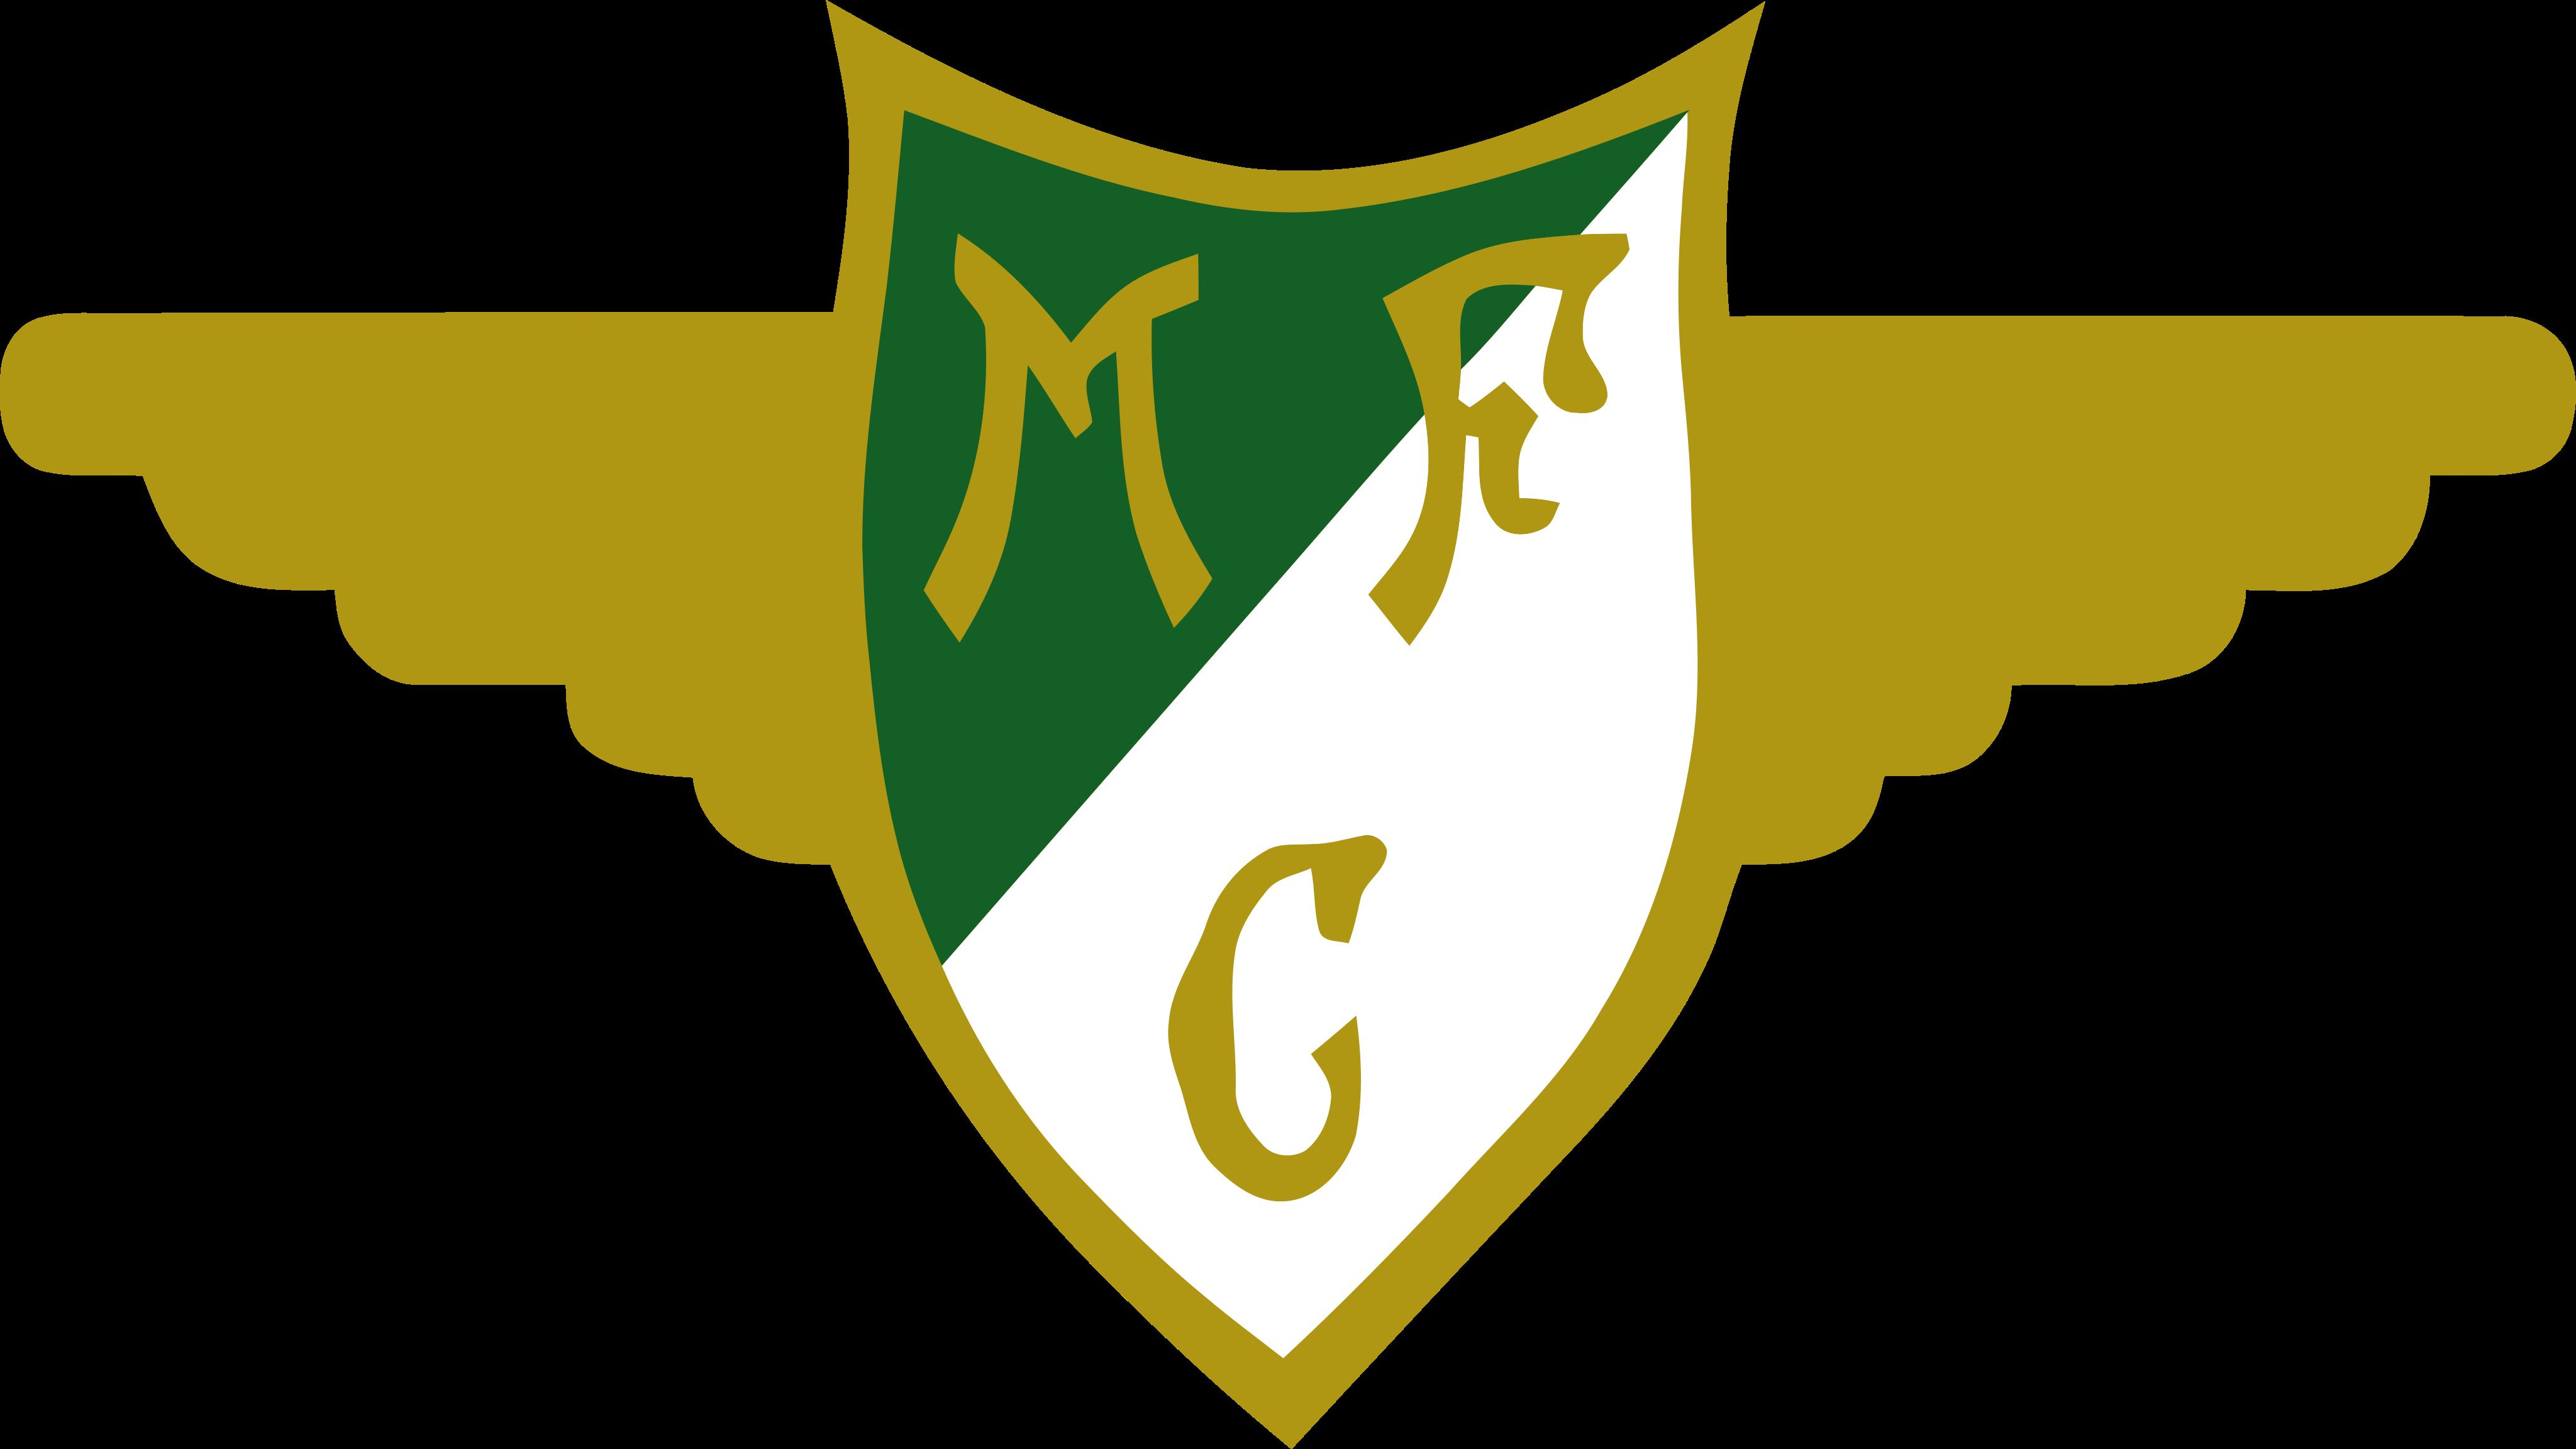 moreirense fc logo - Moreirense FC Logo